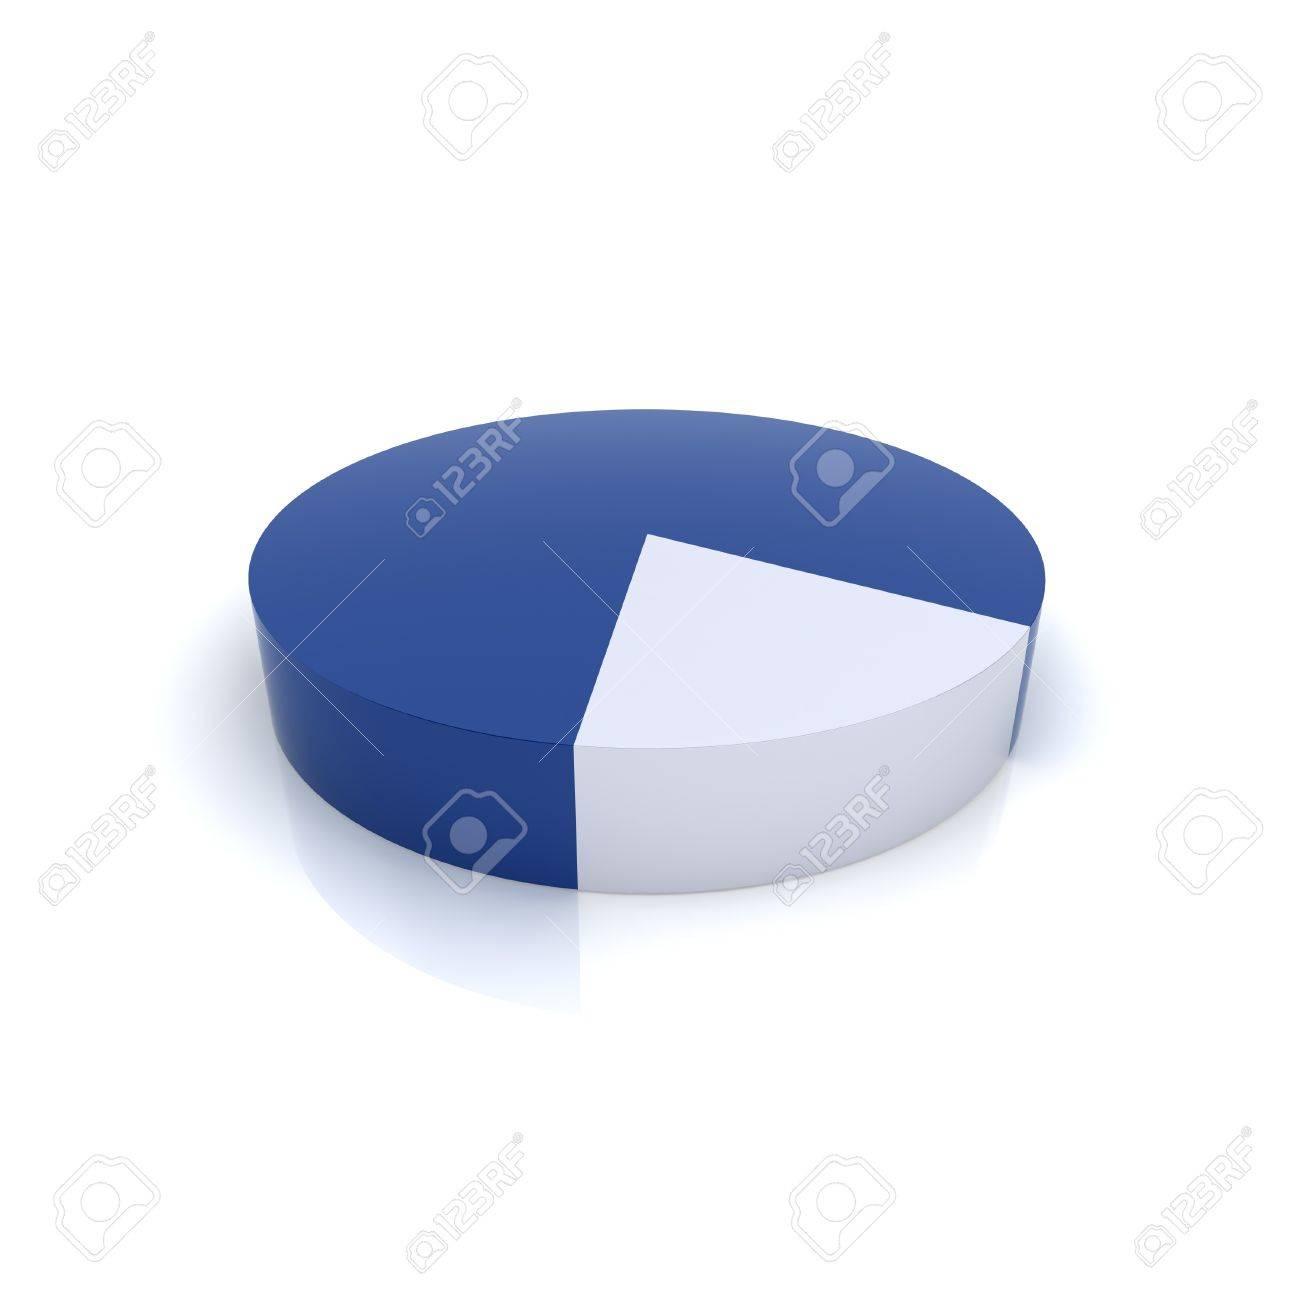 Illustration of metallic pie chart (blue collection) - 10131356